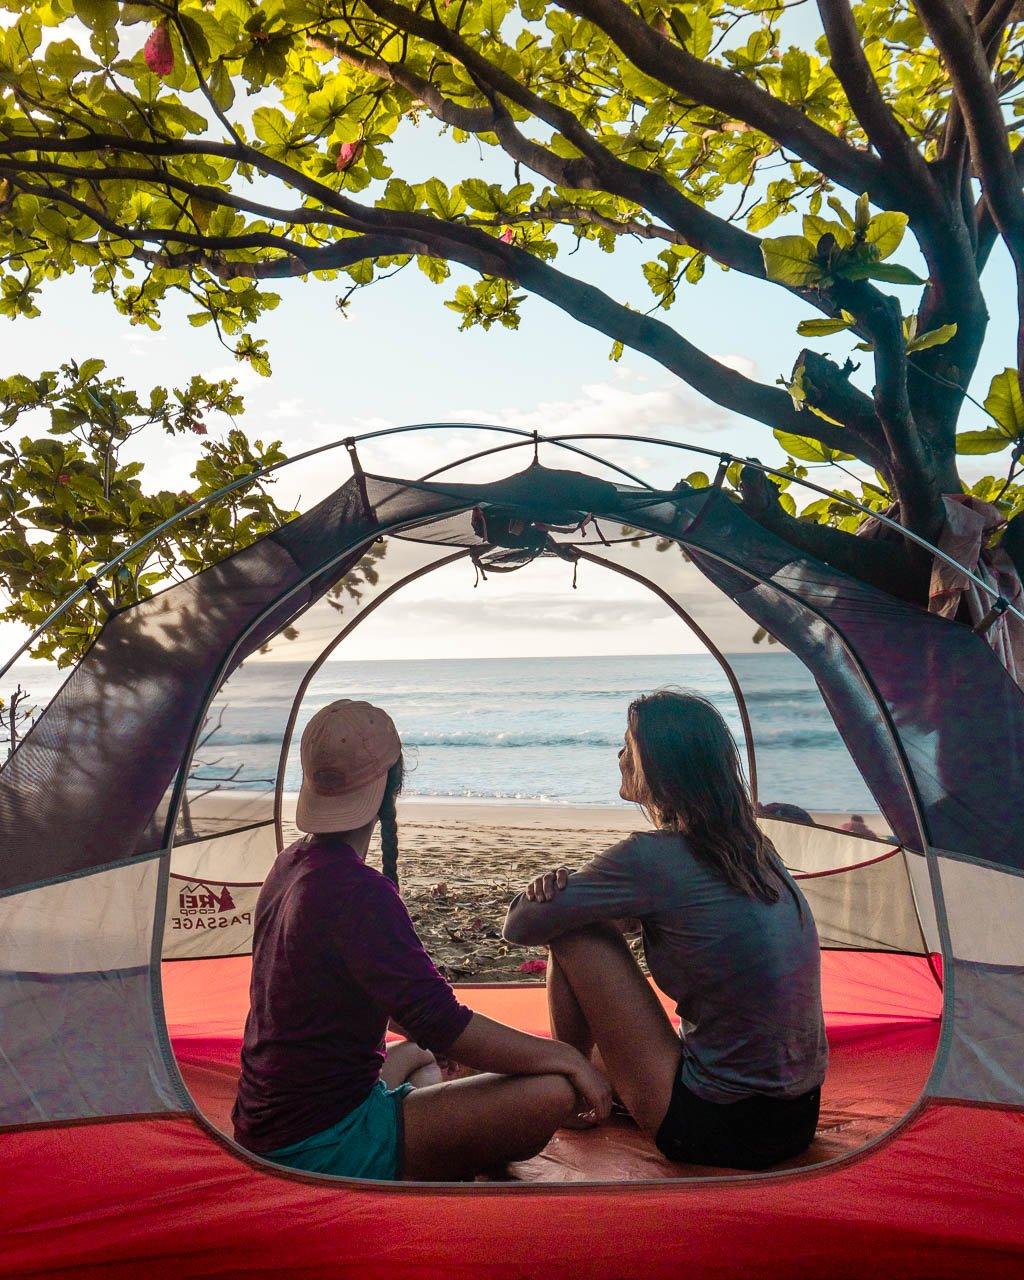 Kalalau Beach Camping, Kauai, Hawaii